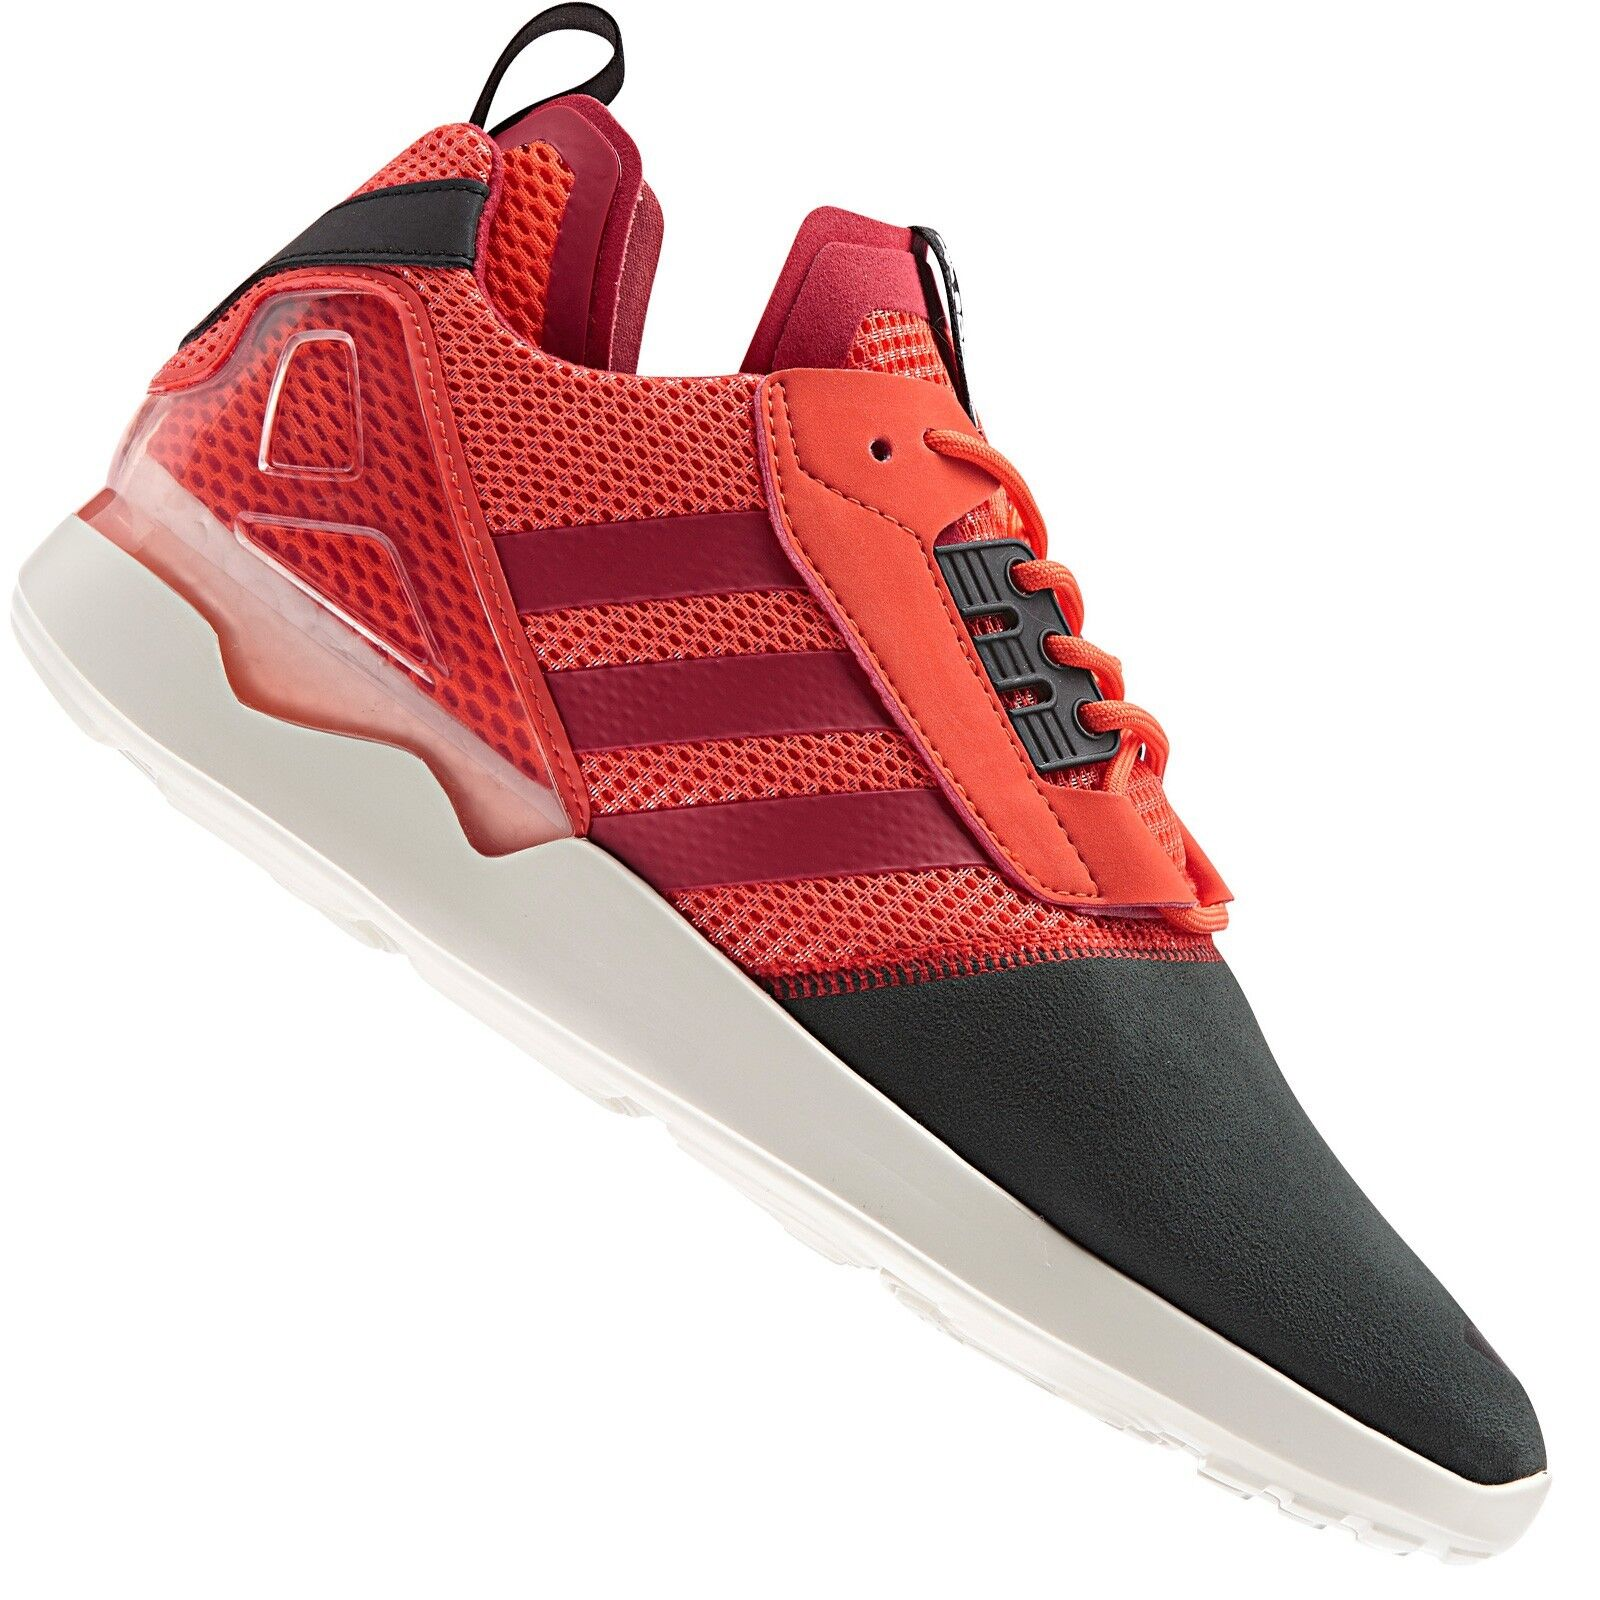 ADIDAS ORIGINALS ZX 8000 BOOST Chaussures de course sport rouge noir 40